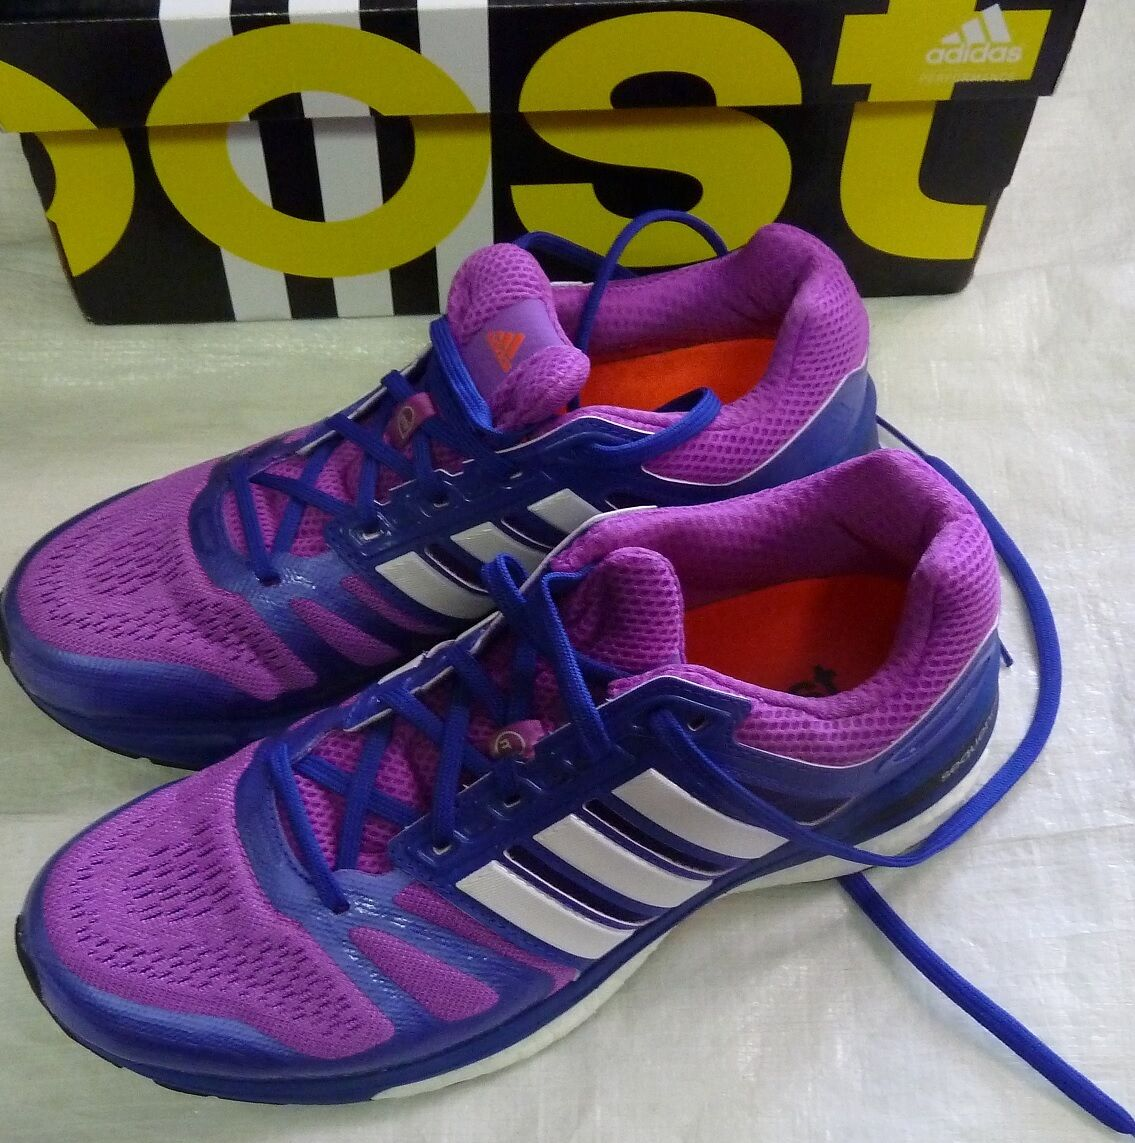 Adidas Women's Supernova Sequence Boost 7  Running Shoes Sz 6.5